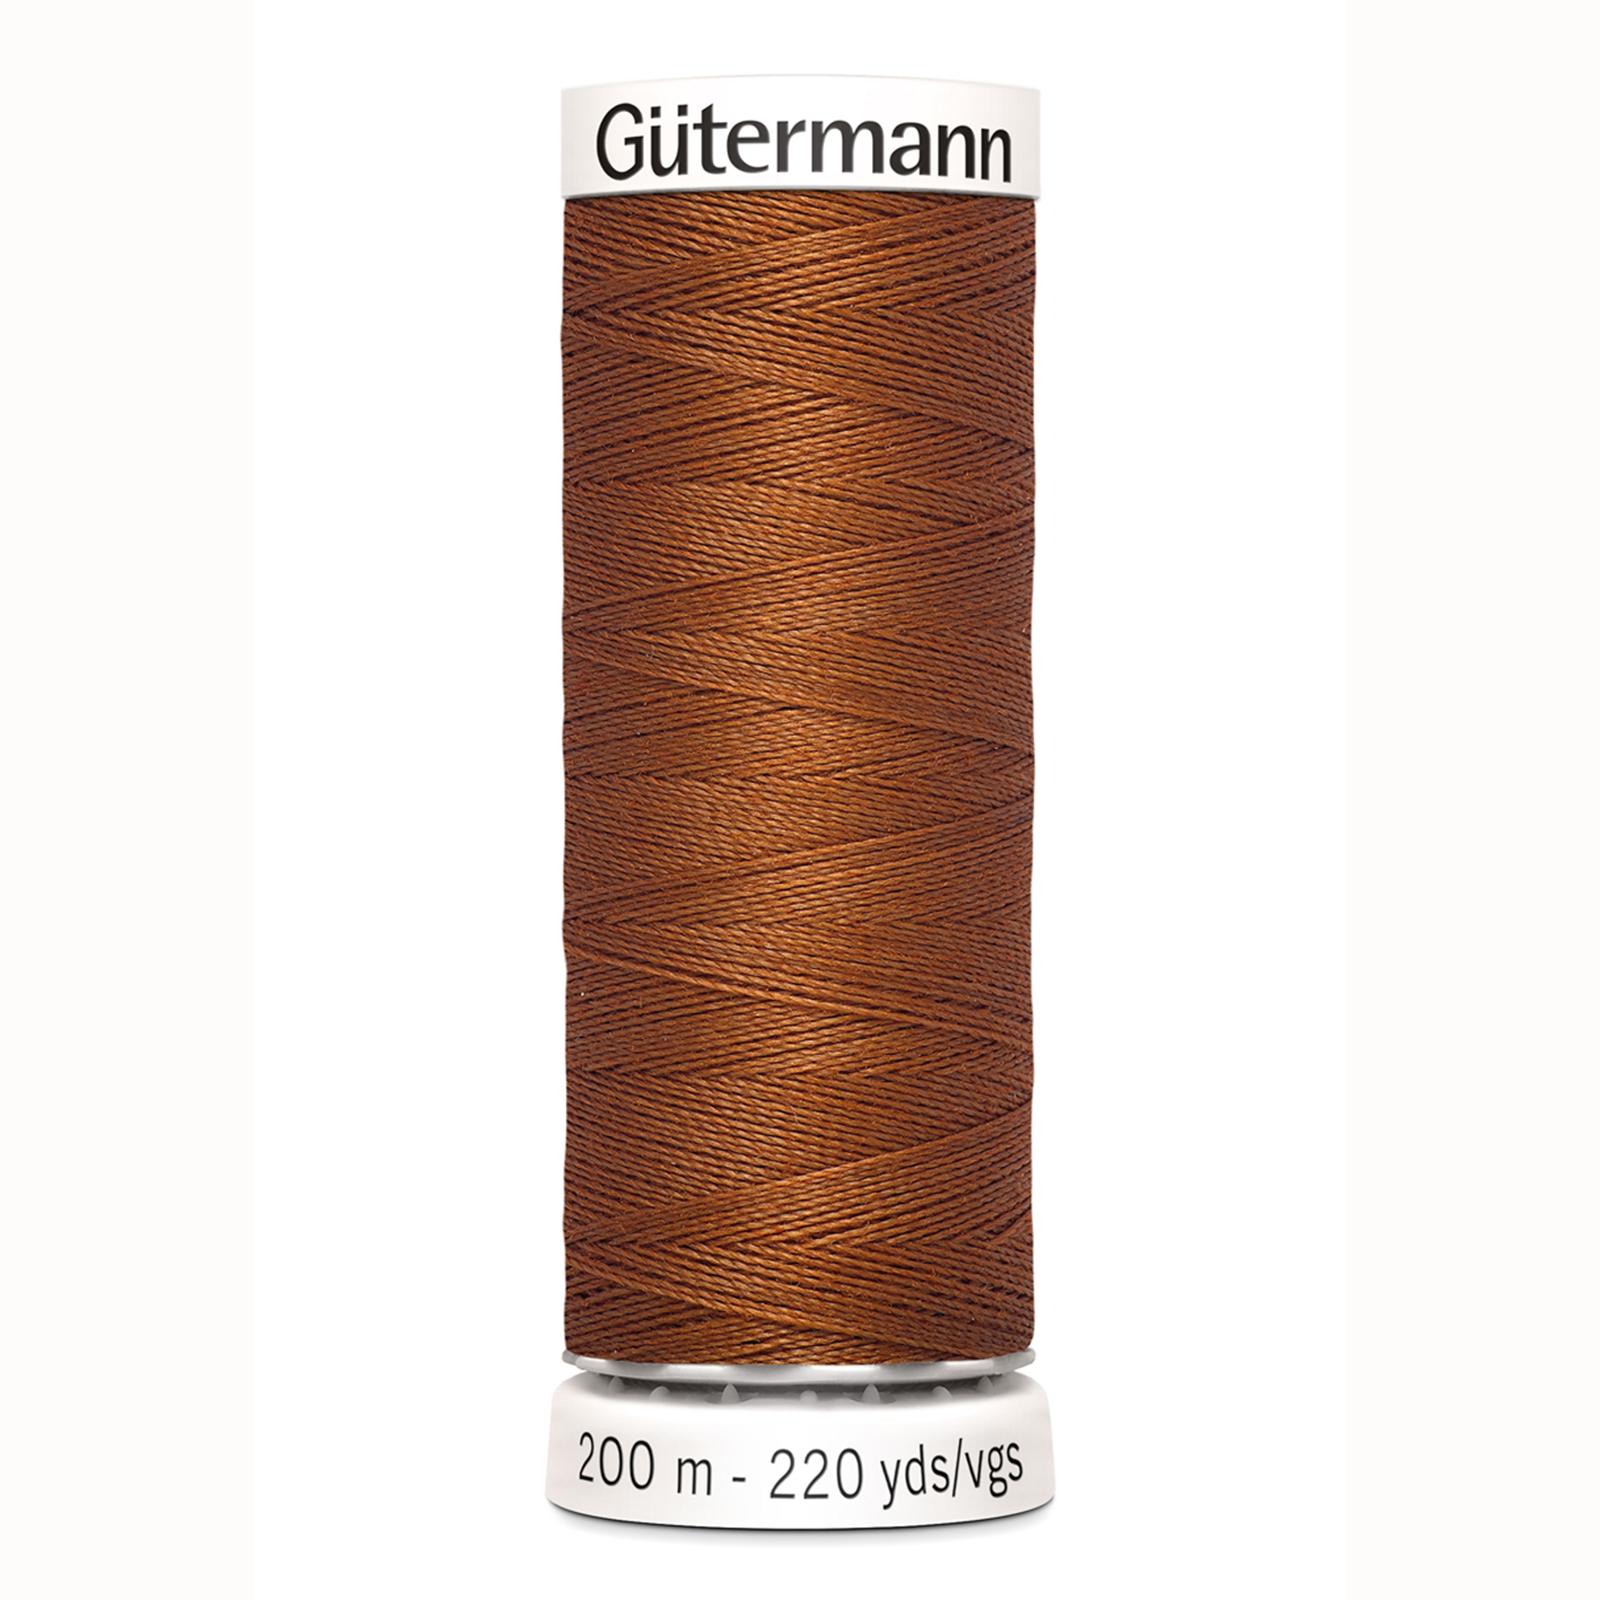 Gutermann Polyestr 200m-649